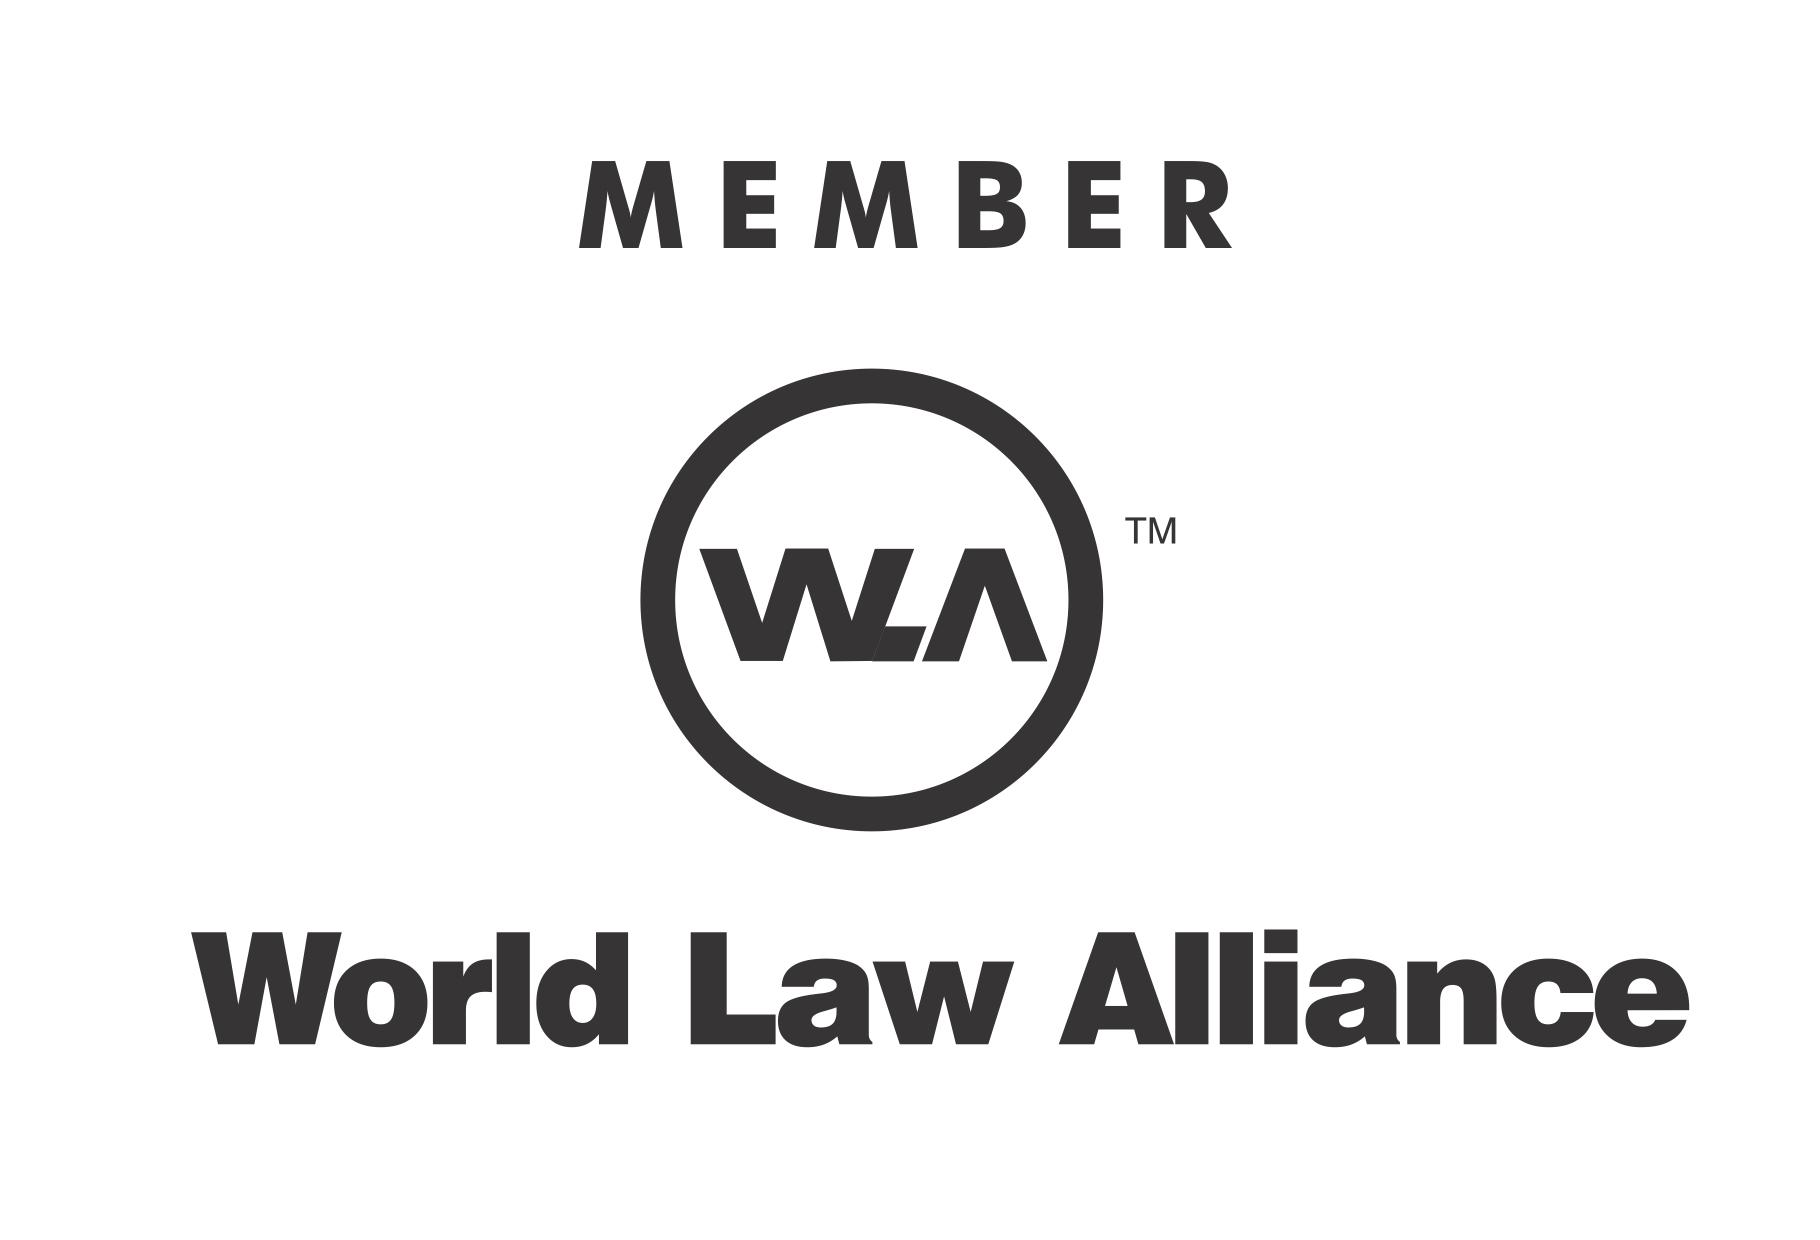 World Law Alliance